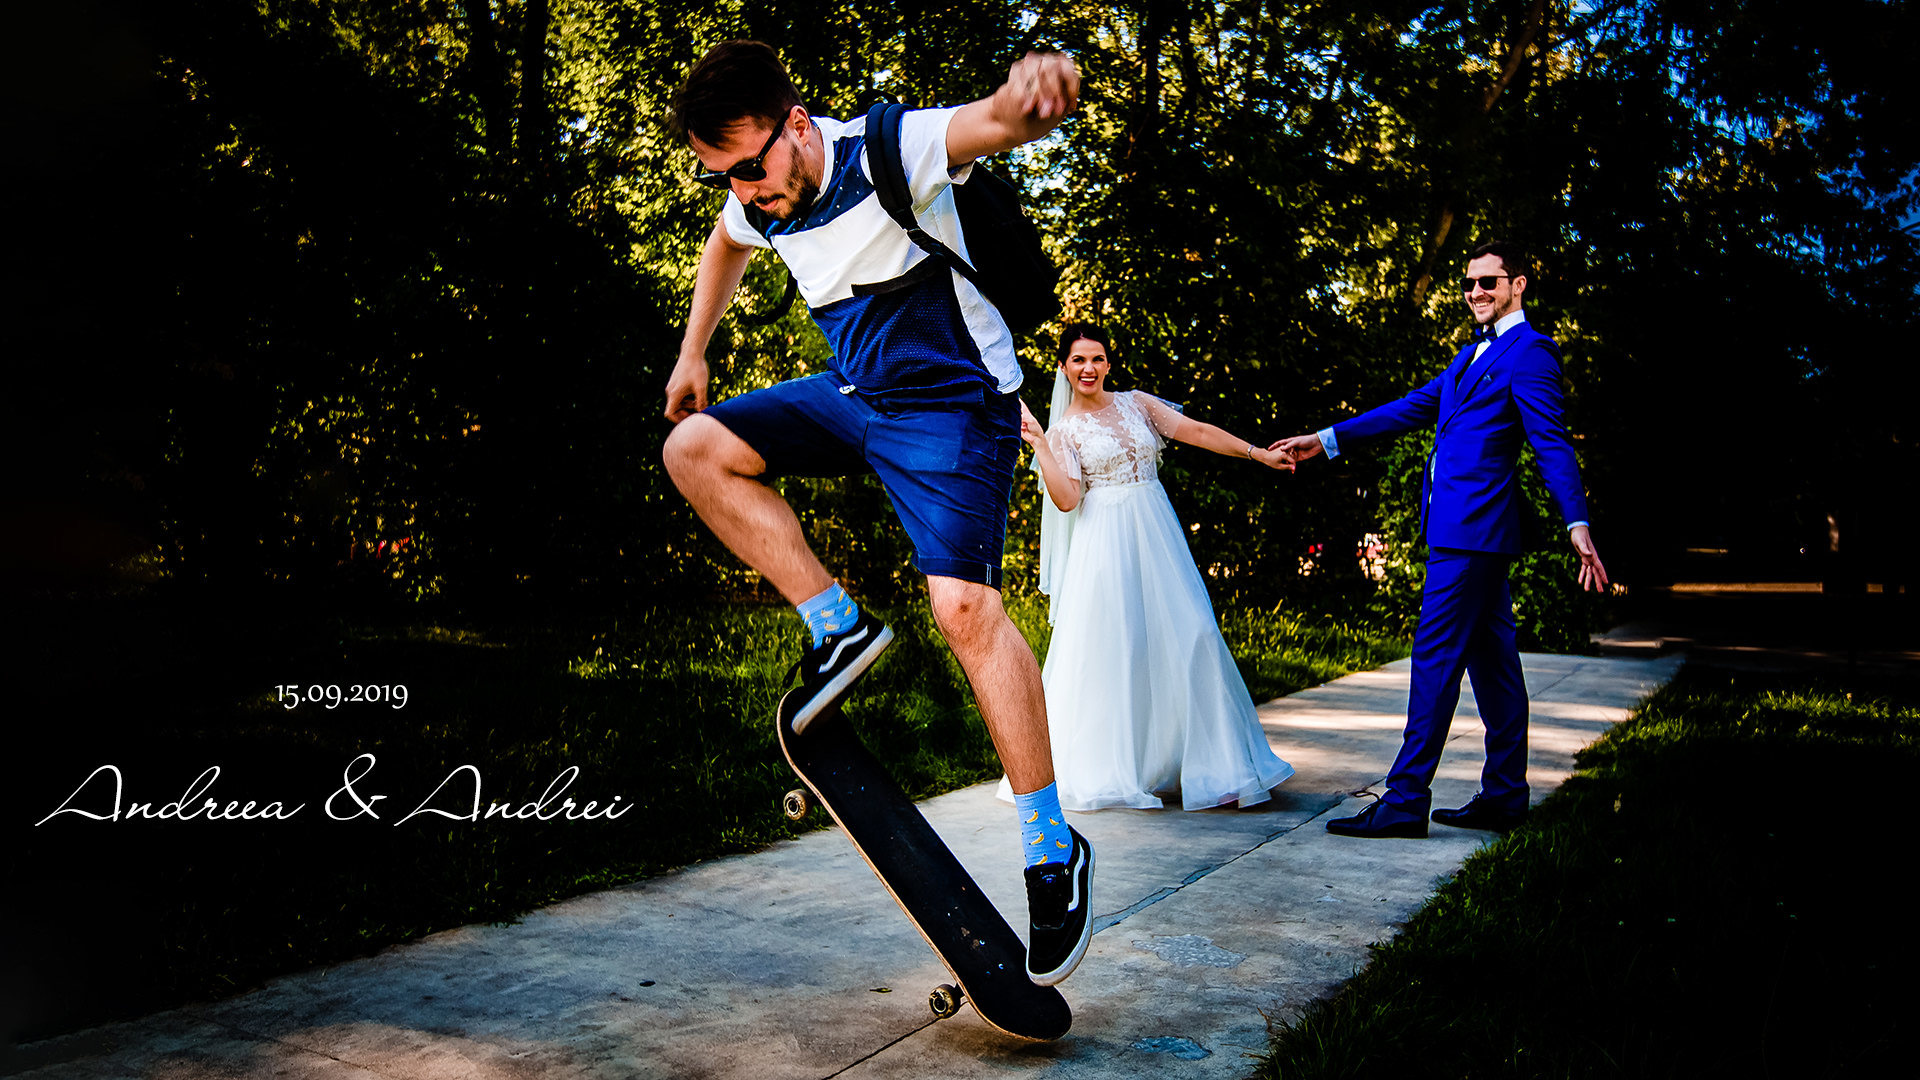 Slideshow De Nunta - Andreea Si Andrei, Gradina Floreasca | Mihai Zaharia Photography